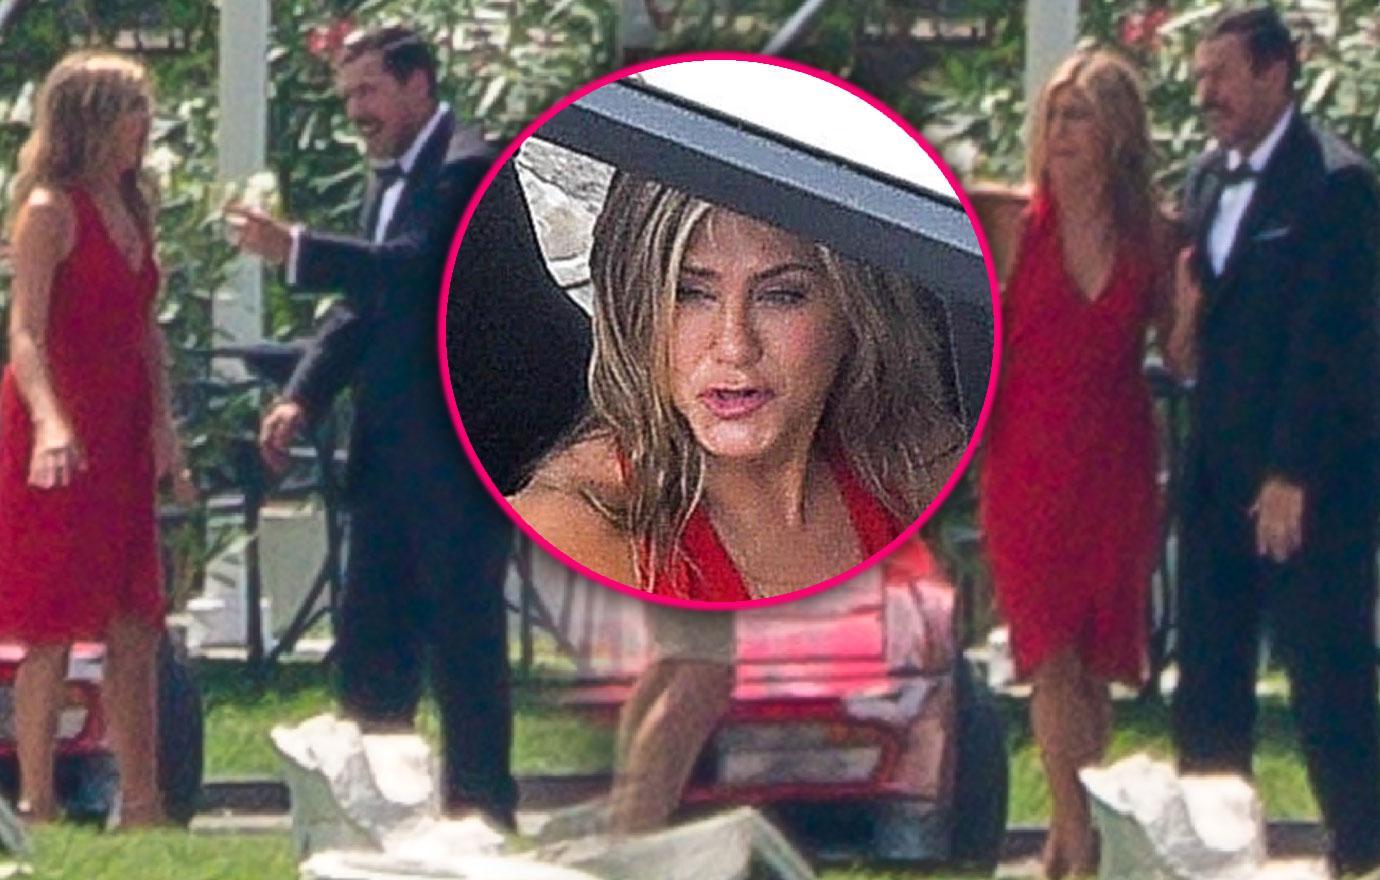 Jennifer Aniston Films Movie With Adam Sandler After Justin Theroux Split